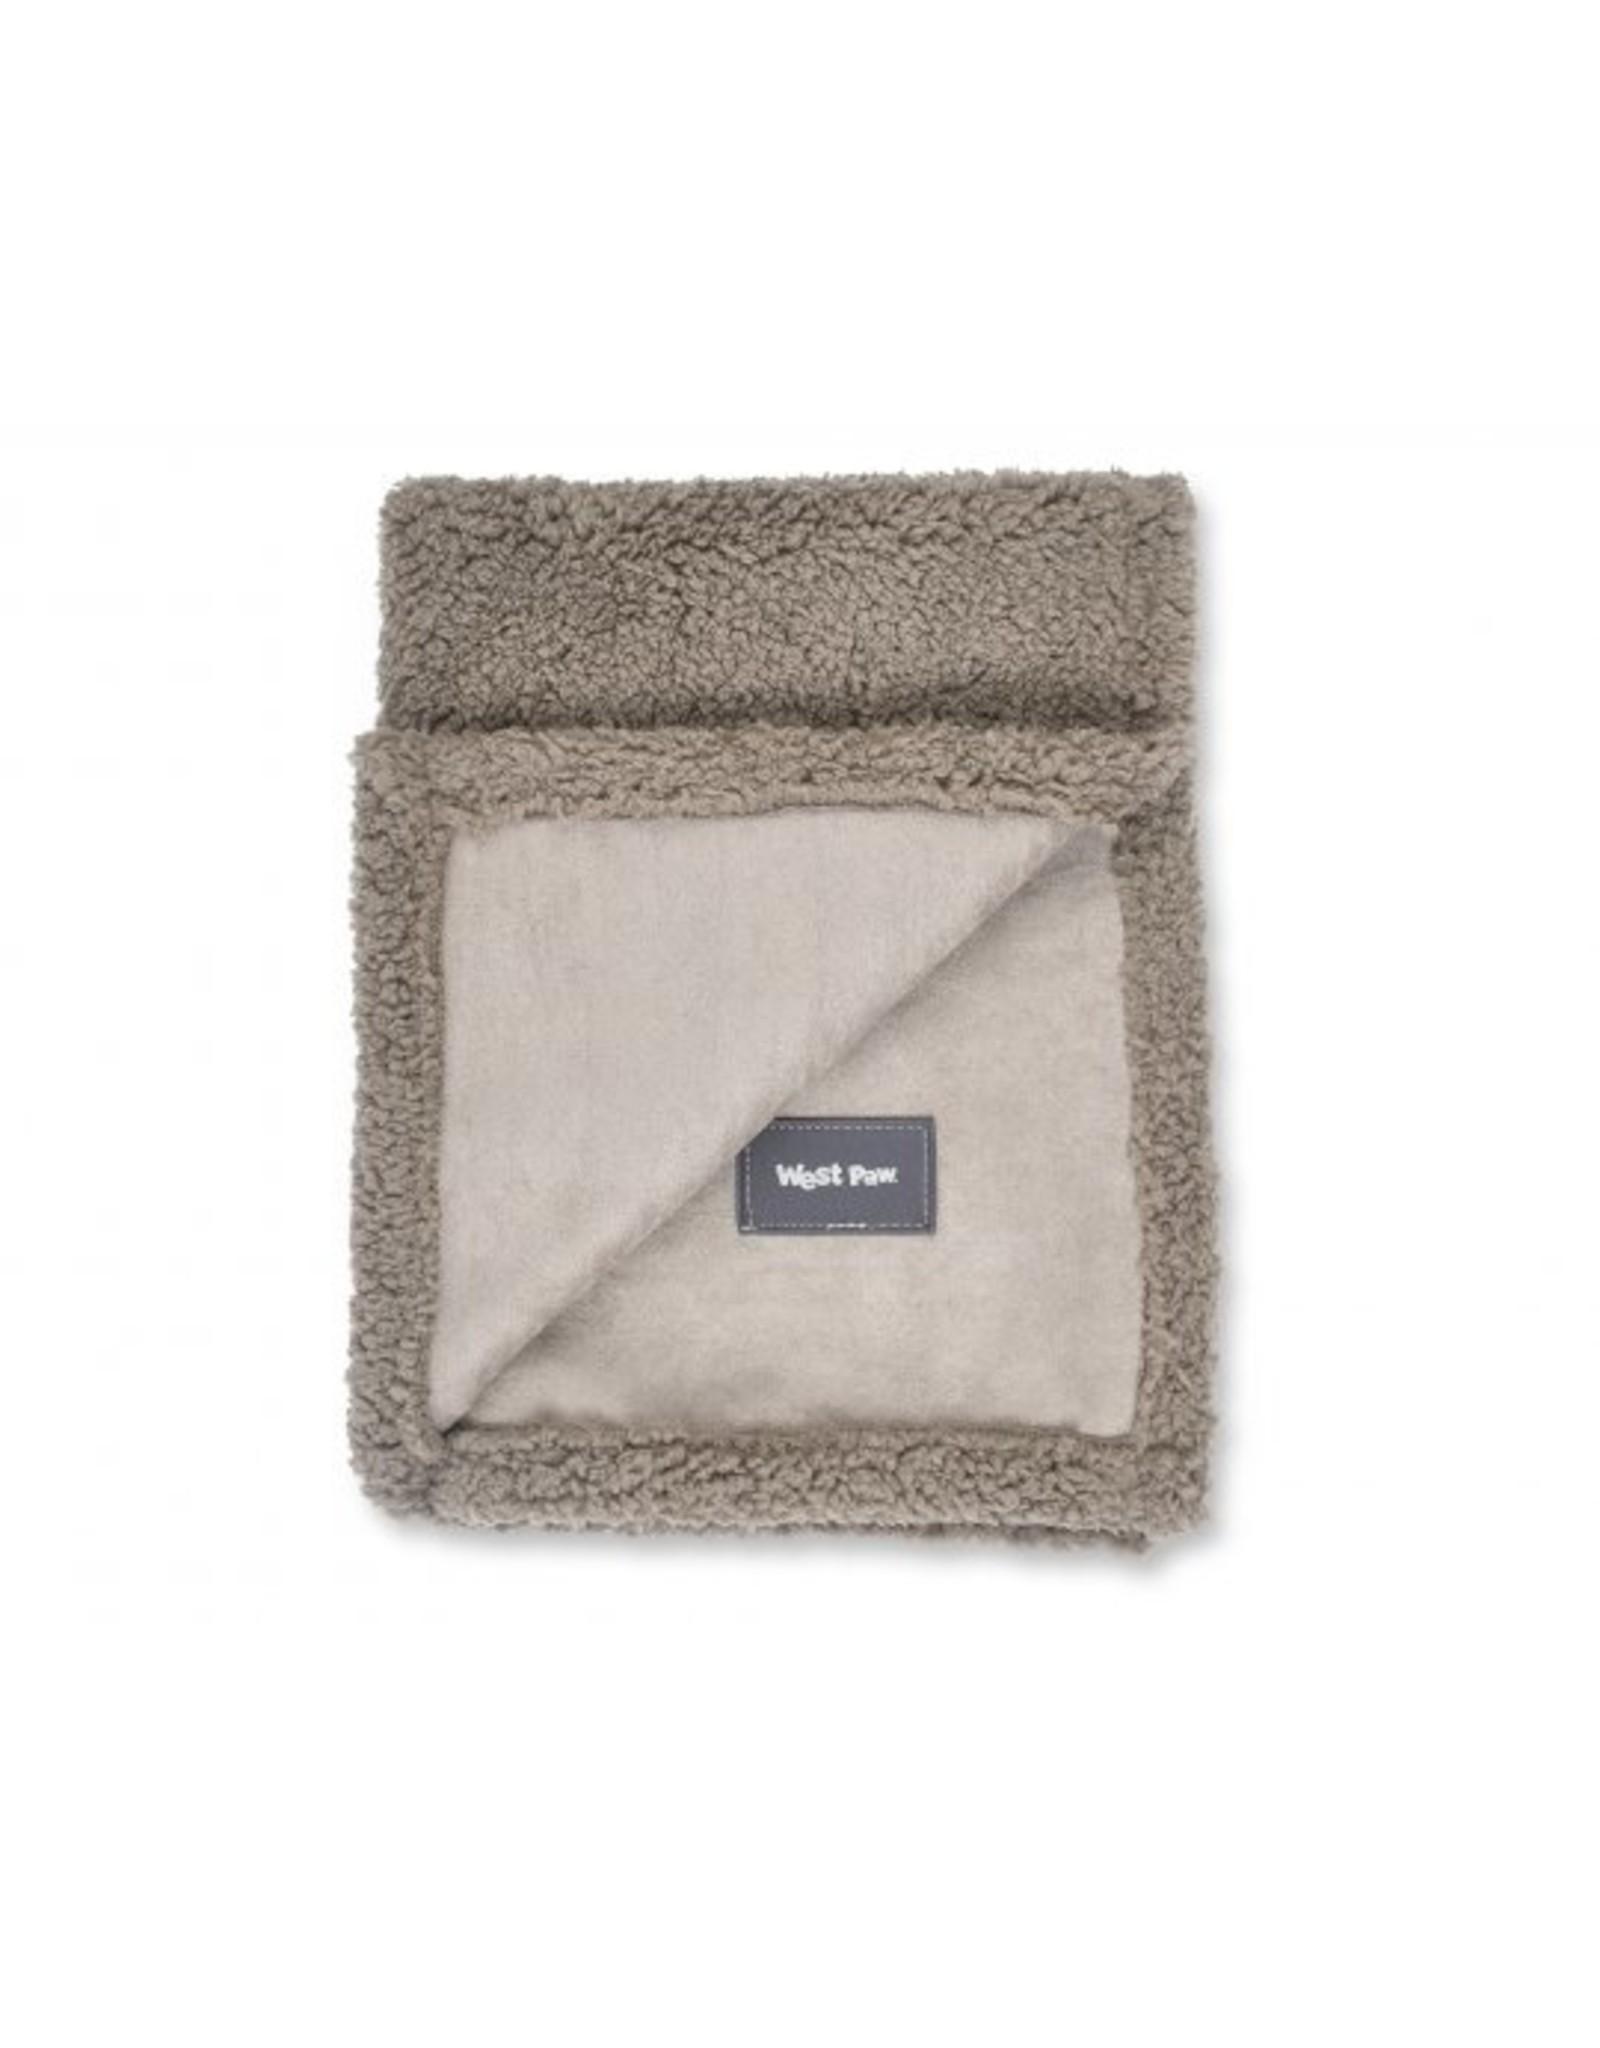 West Paw Designs Westpaw: Big Sky Blanket L 56x73 Oatmeal